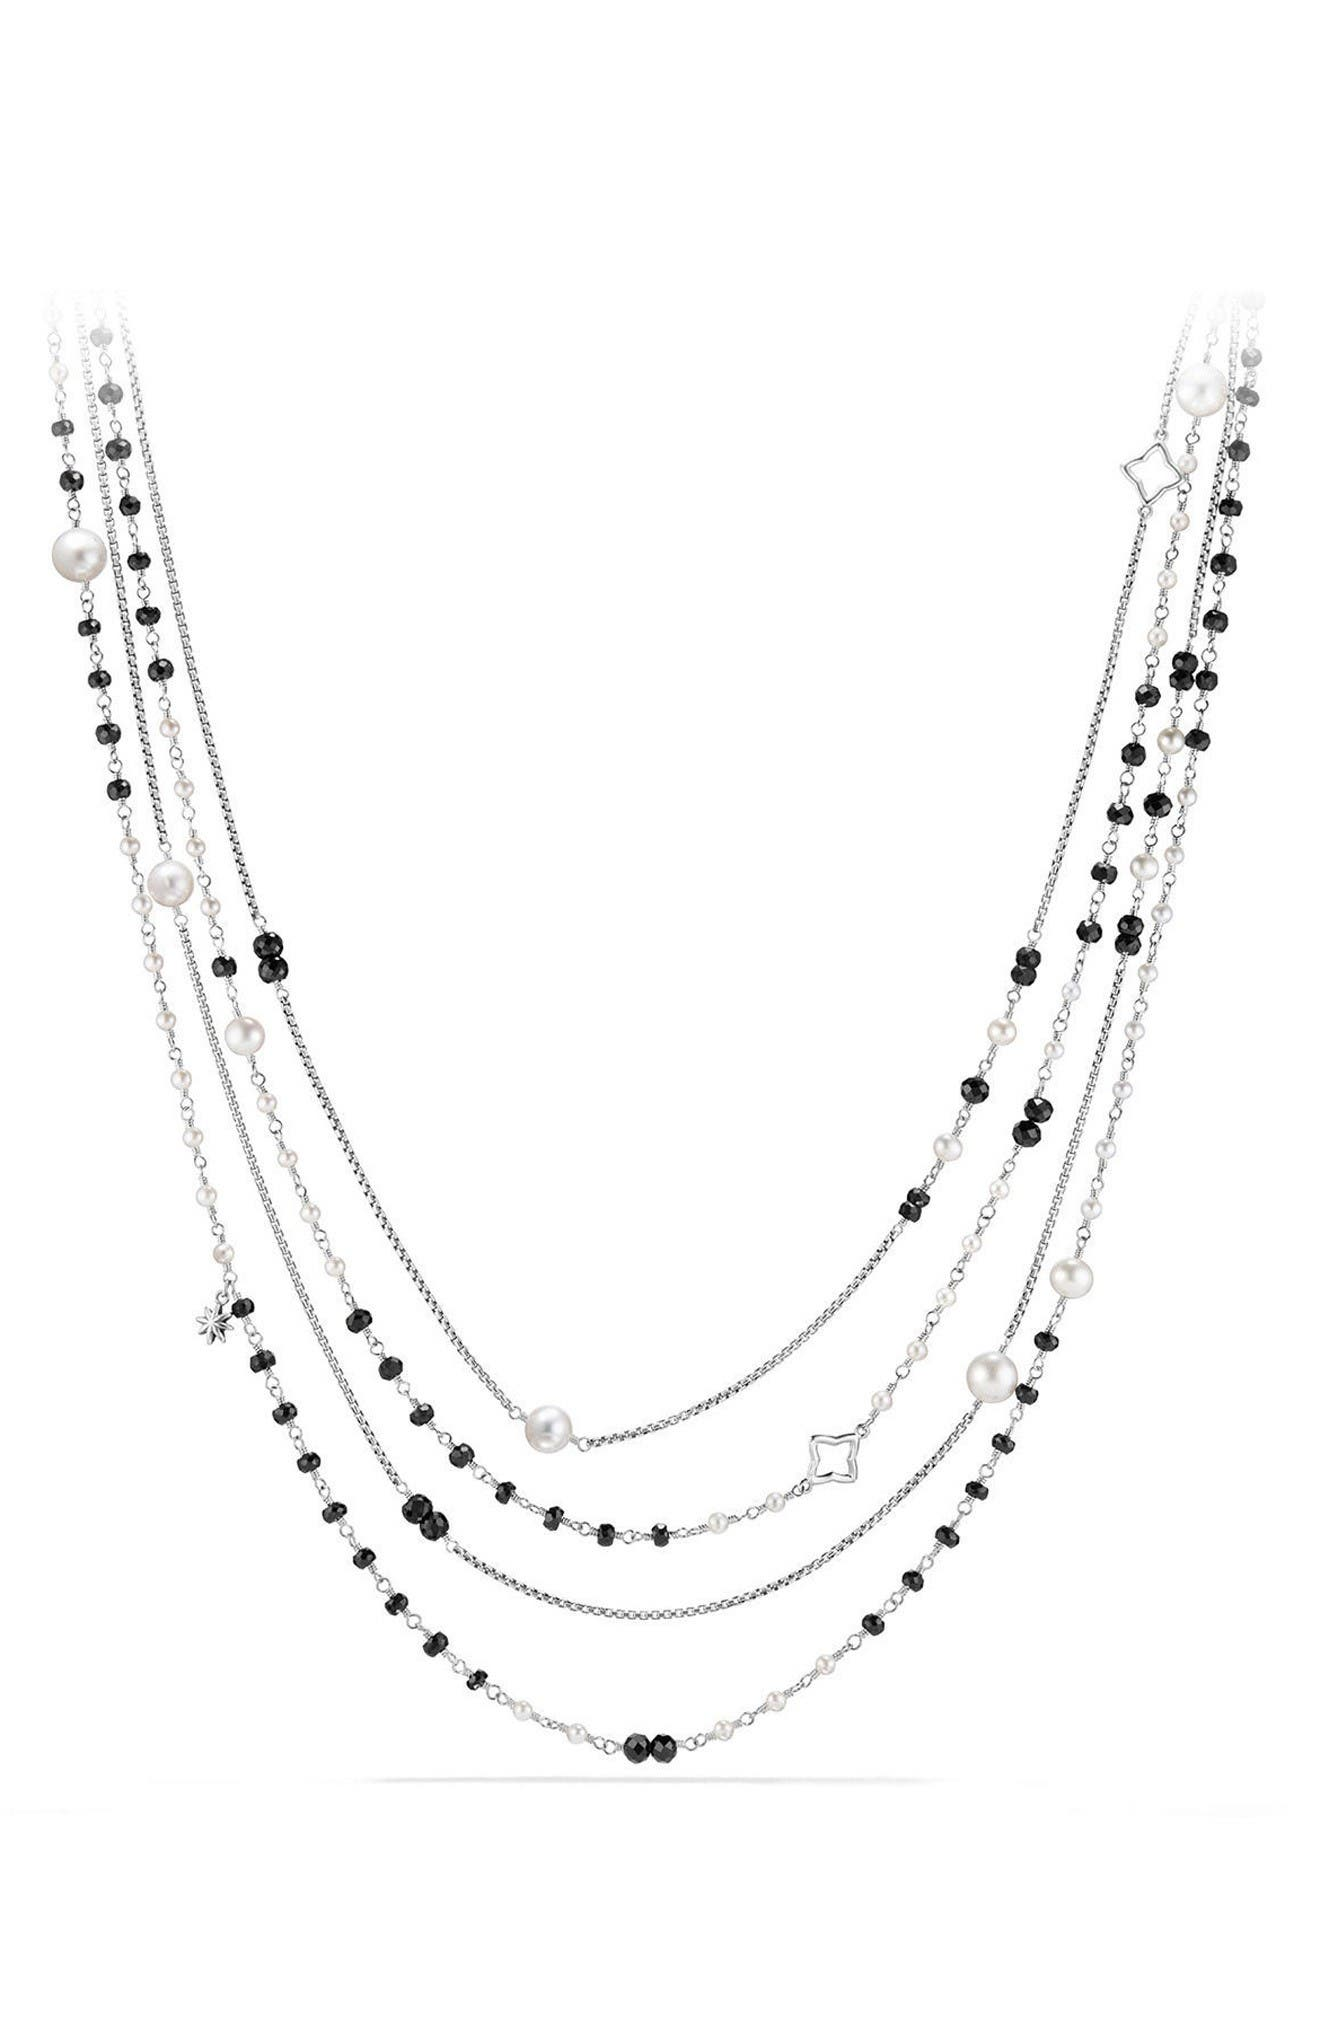 David Yurman Solari Two Row Pearl Chain Necklace